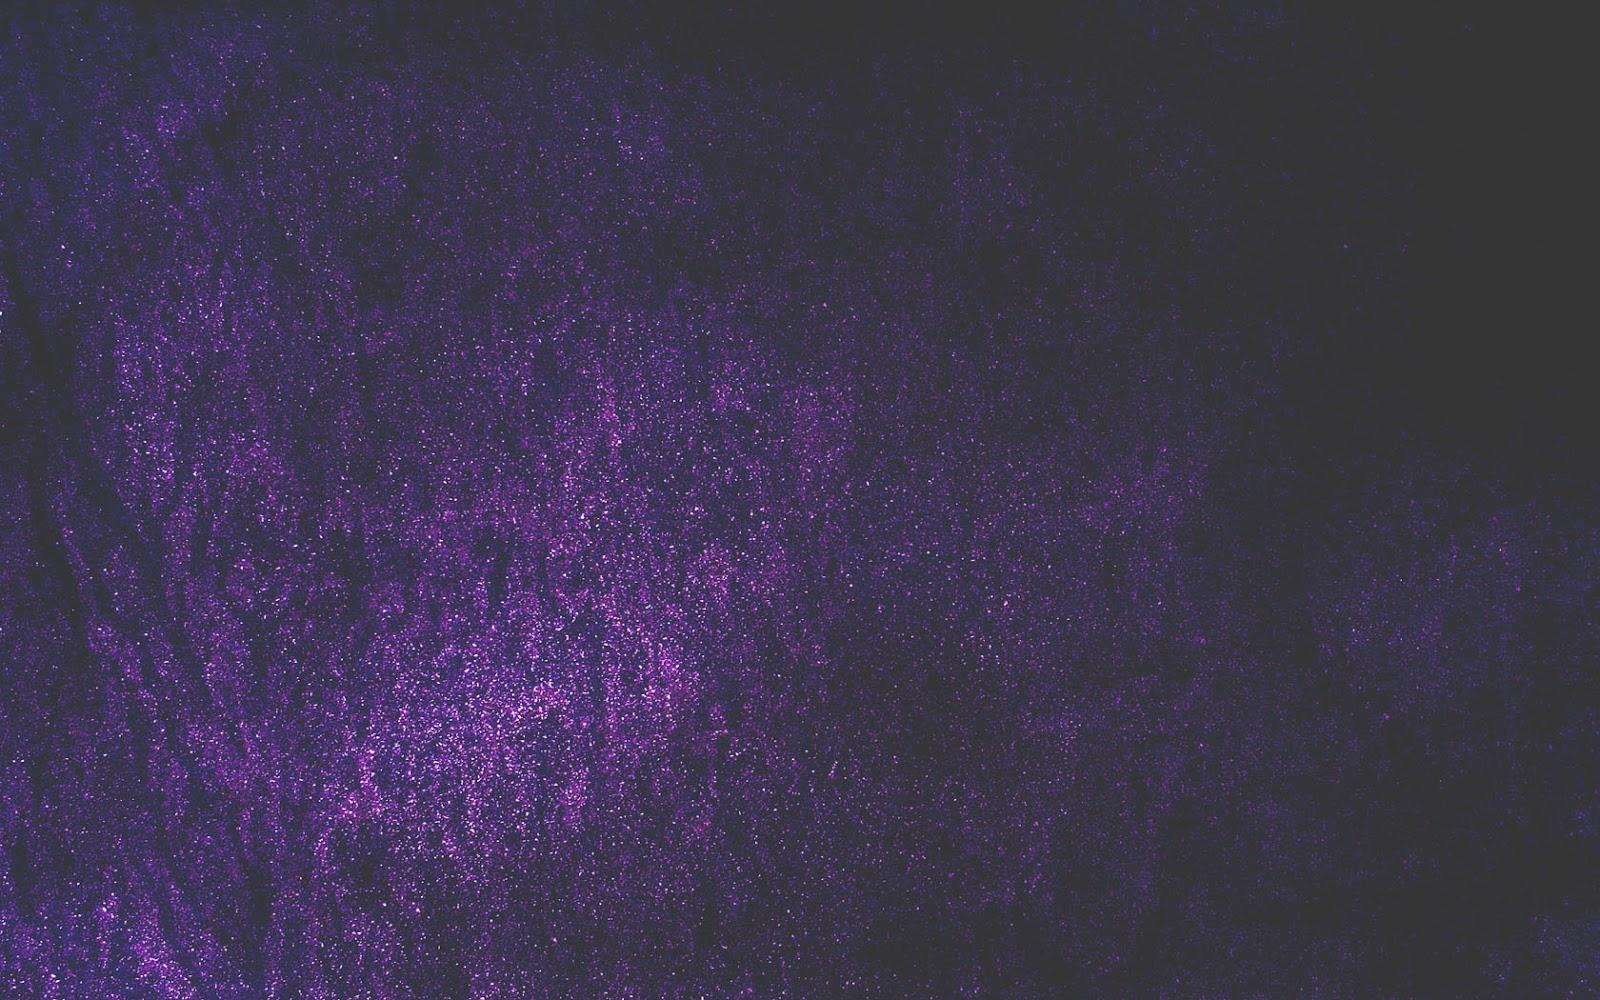 tumblr wallpaper photography - photo #43